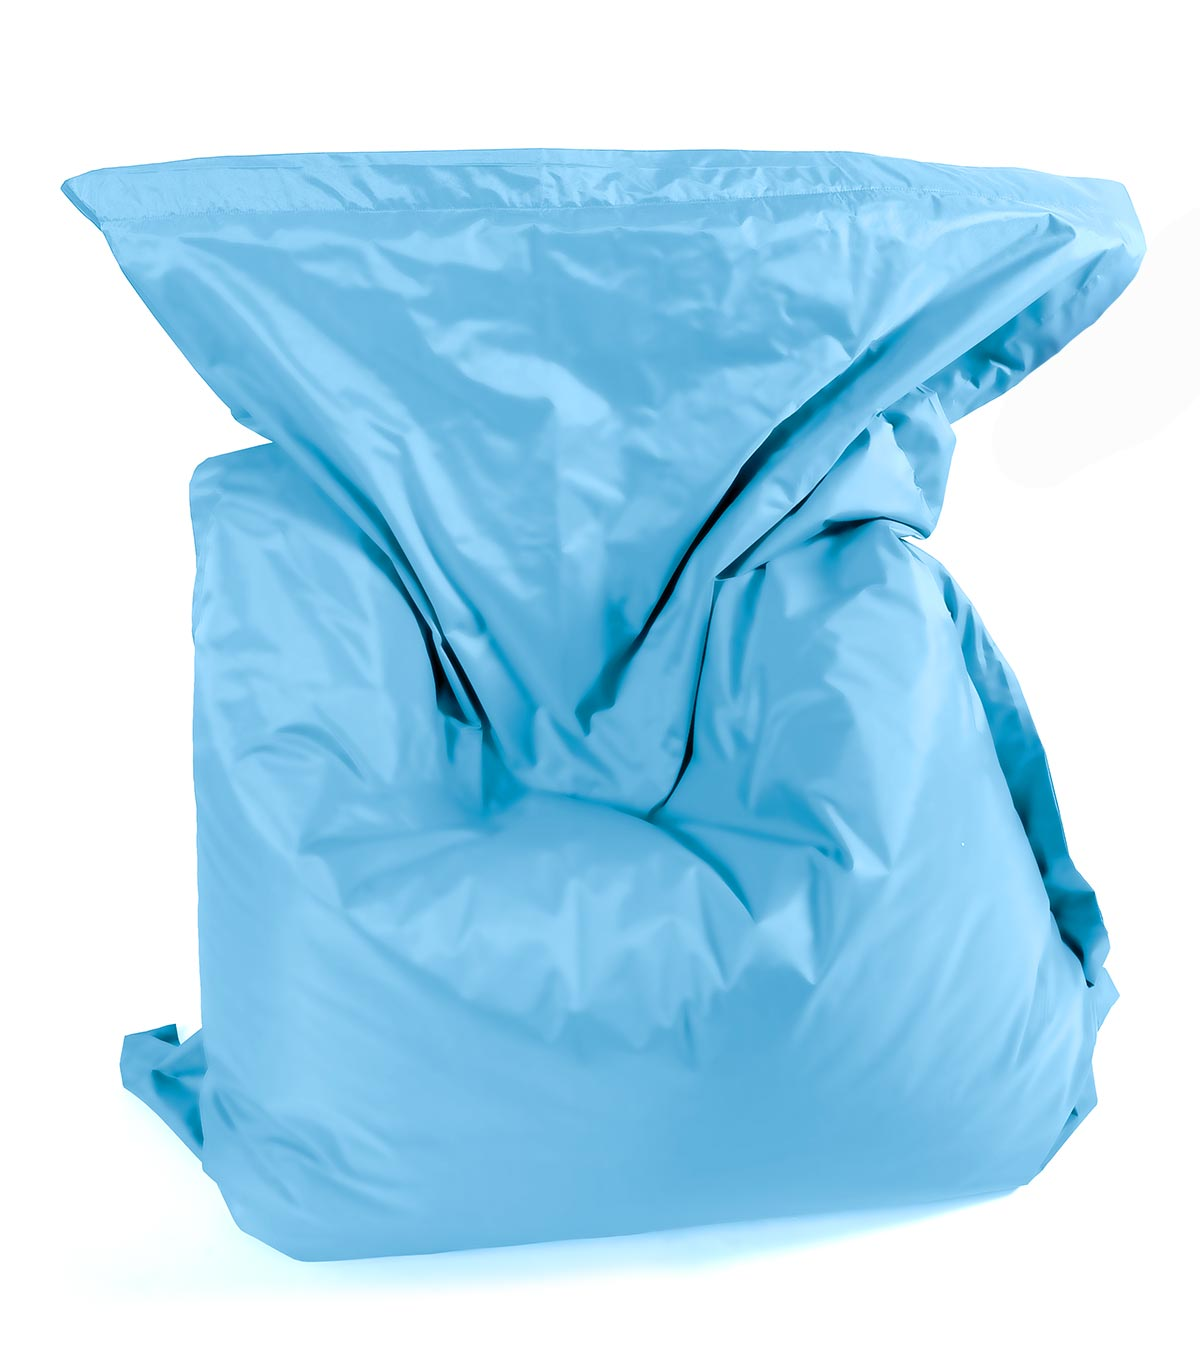 pouf loftbag bleu ciel. Black Bedroom Furniture Sets. Home Design Ideas